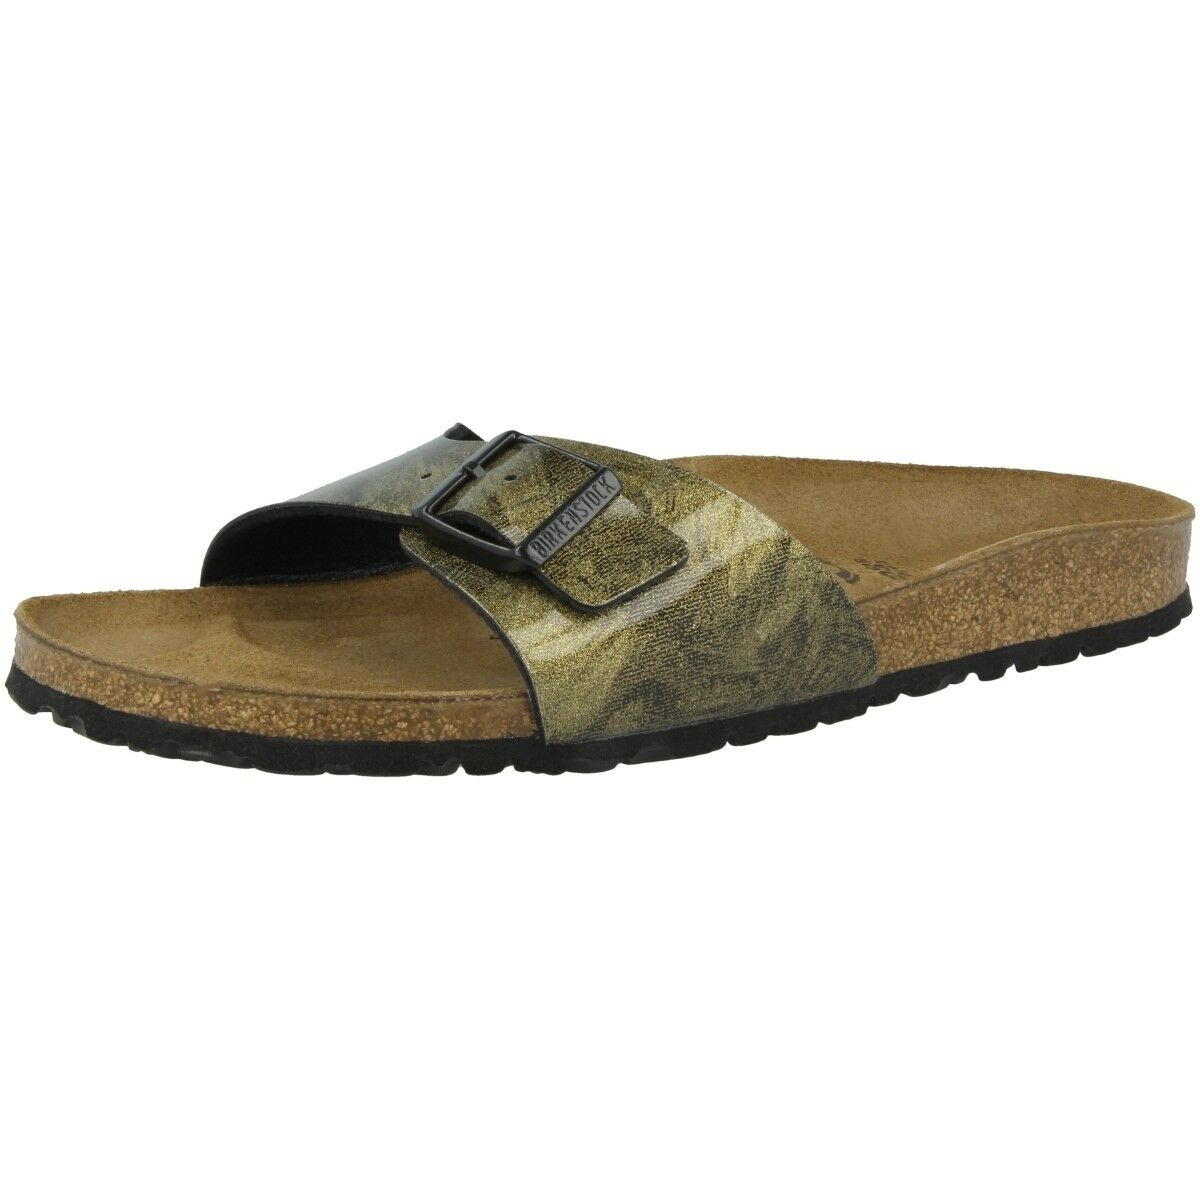 Birkenstock madrid Birko-flor sandalias zapatos sandalias ancho estrecho 1011175